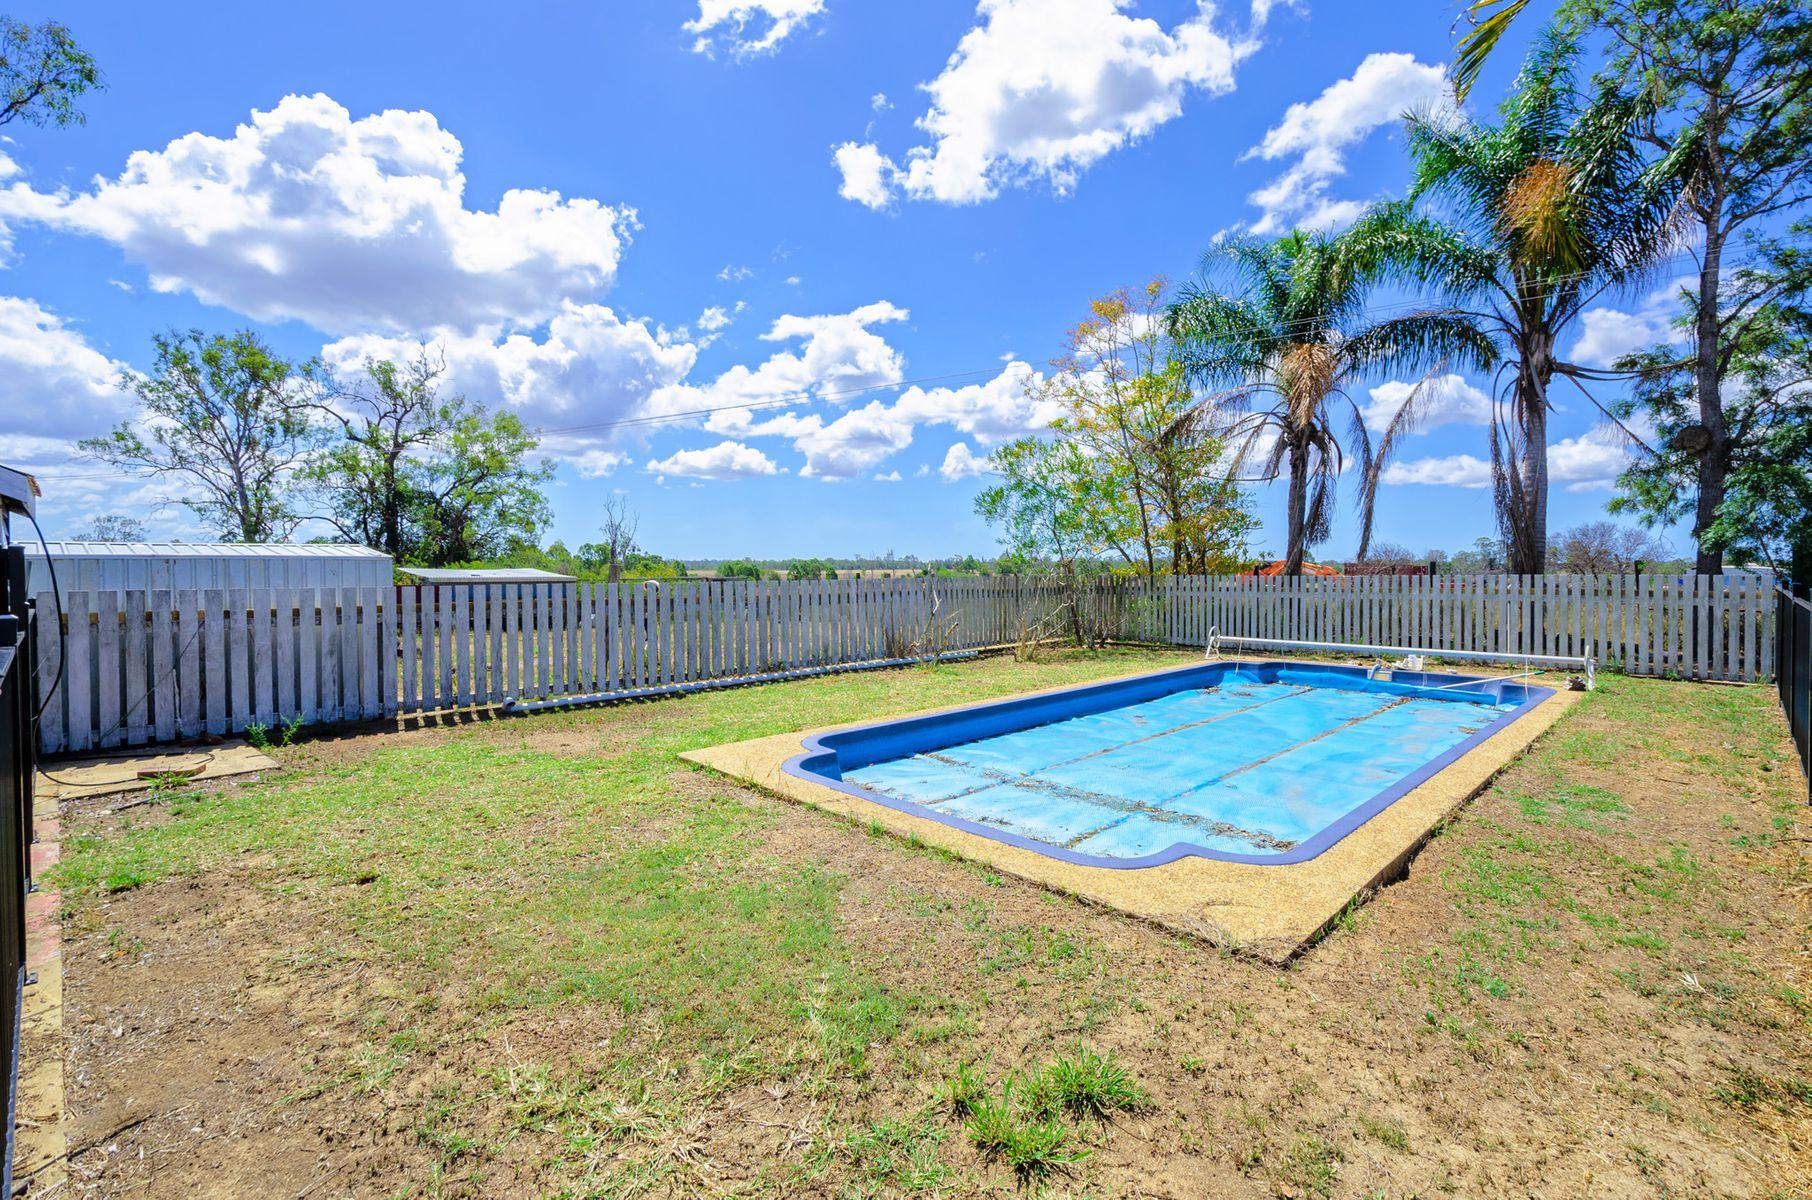 1312 Bucca Road, Bucca, QLD 4670